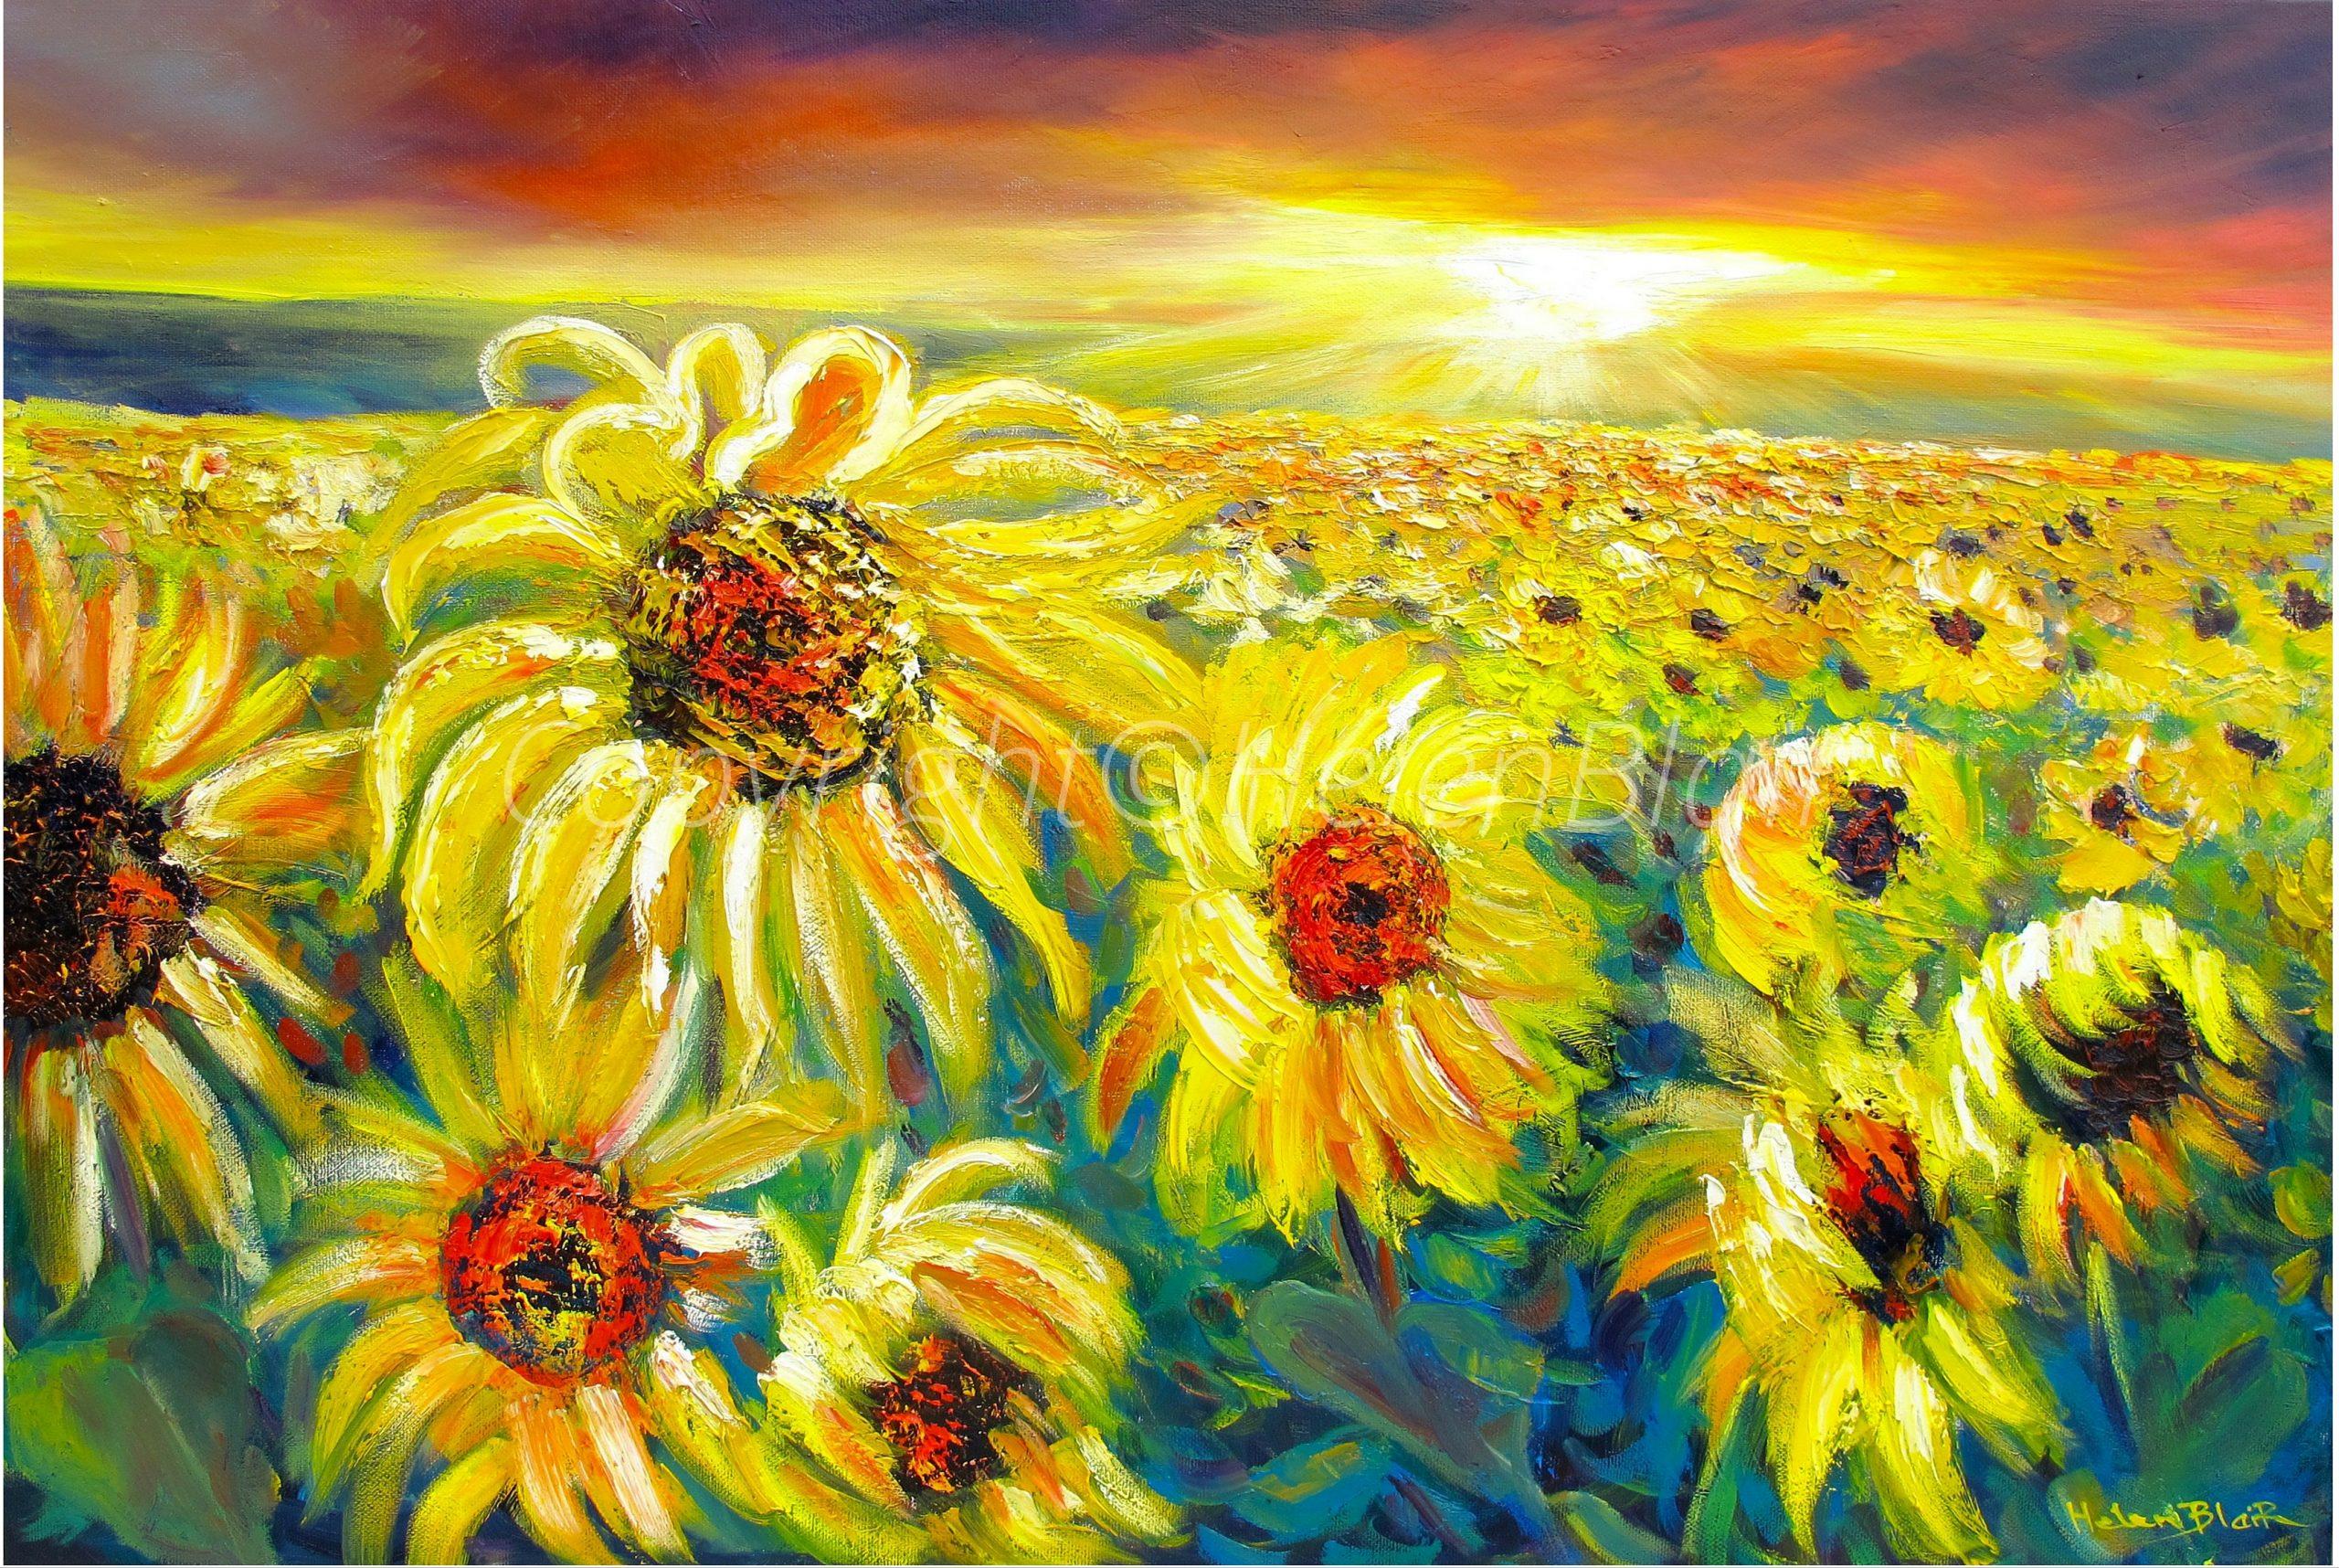 Copyright©HelenBlairsart, Sunflowers